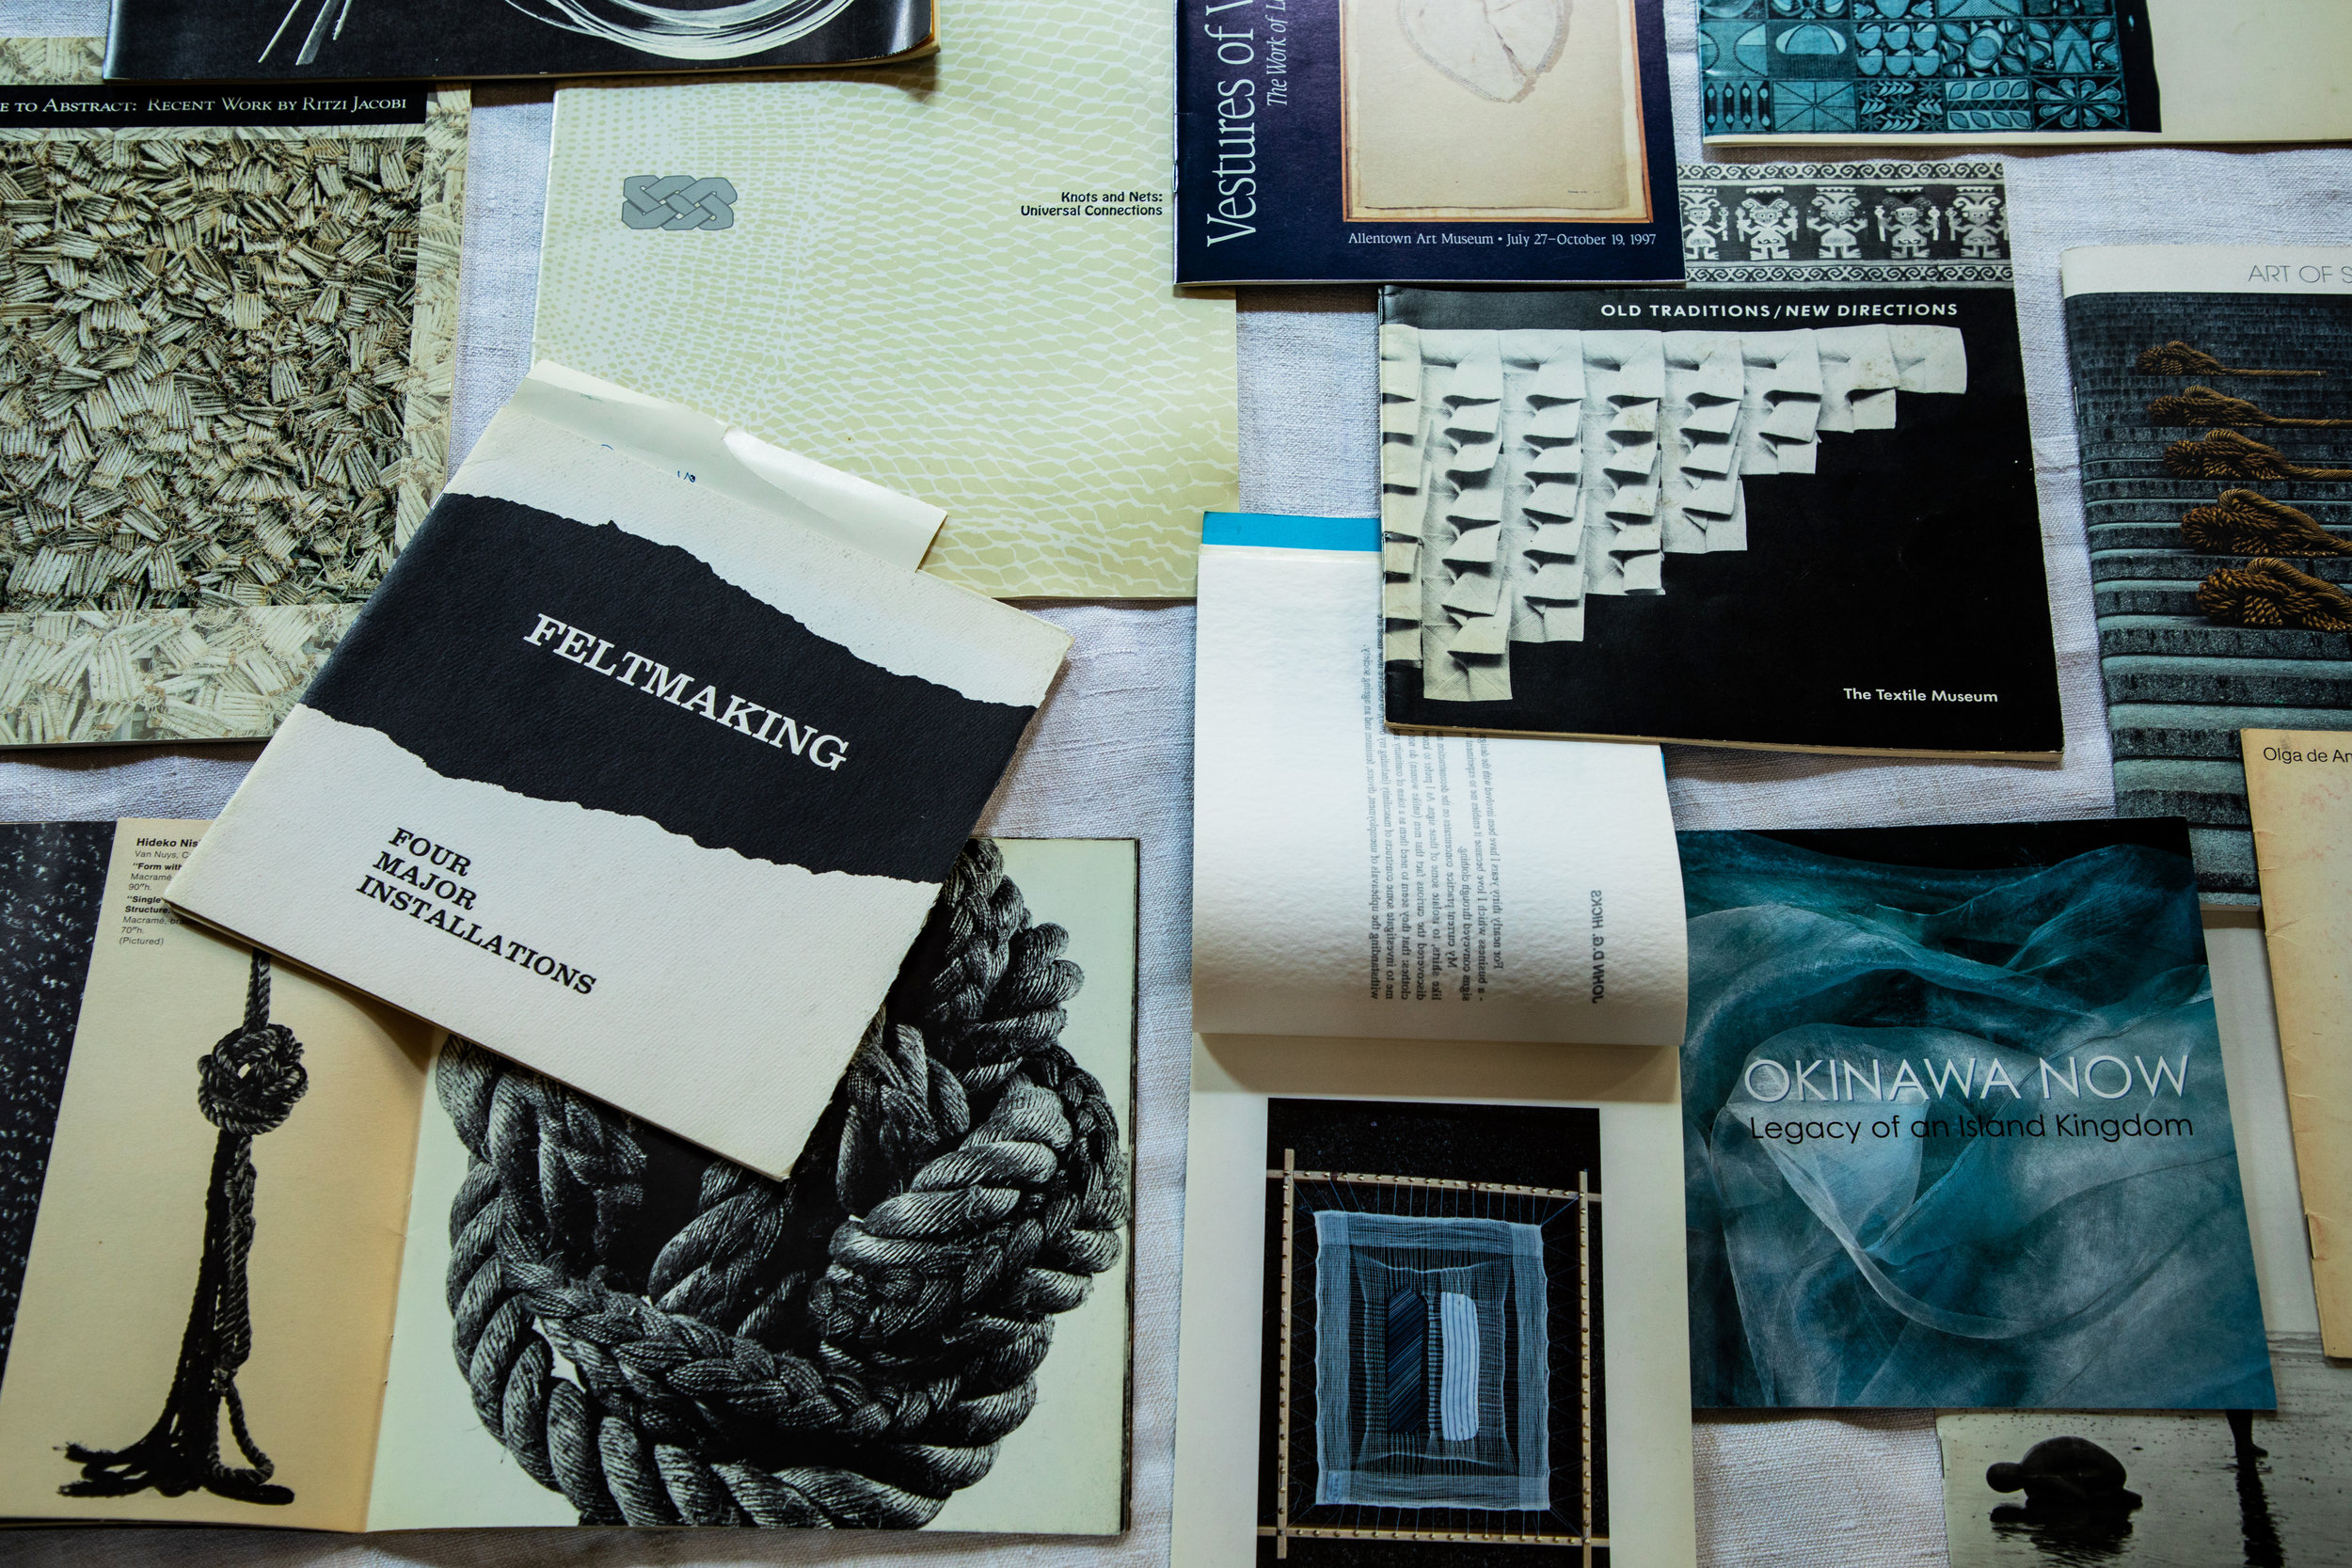 exhibitioncatalogs copy.jpg